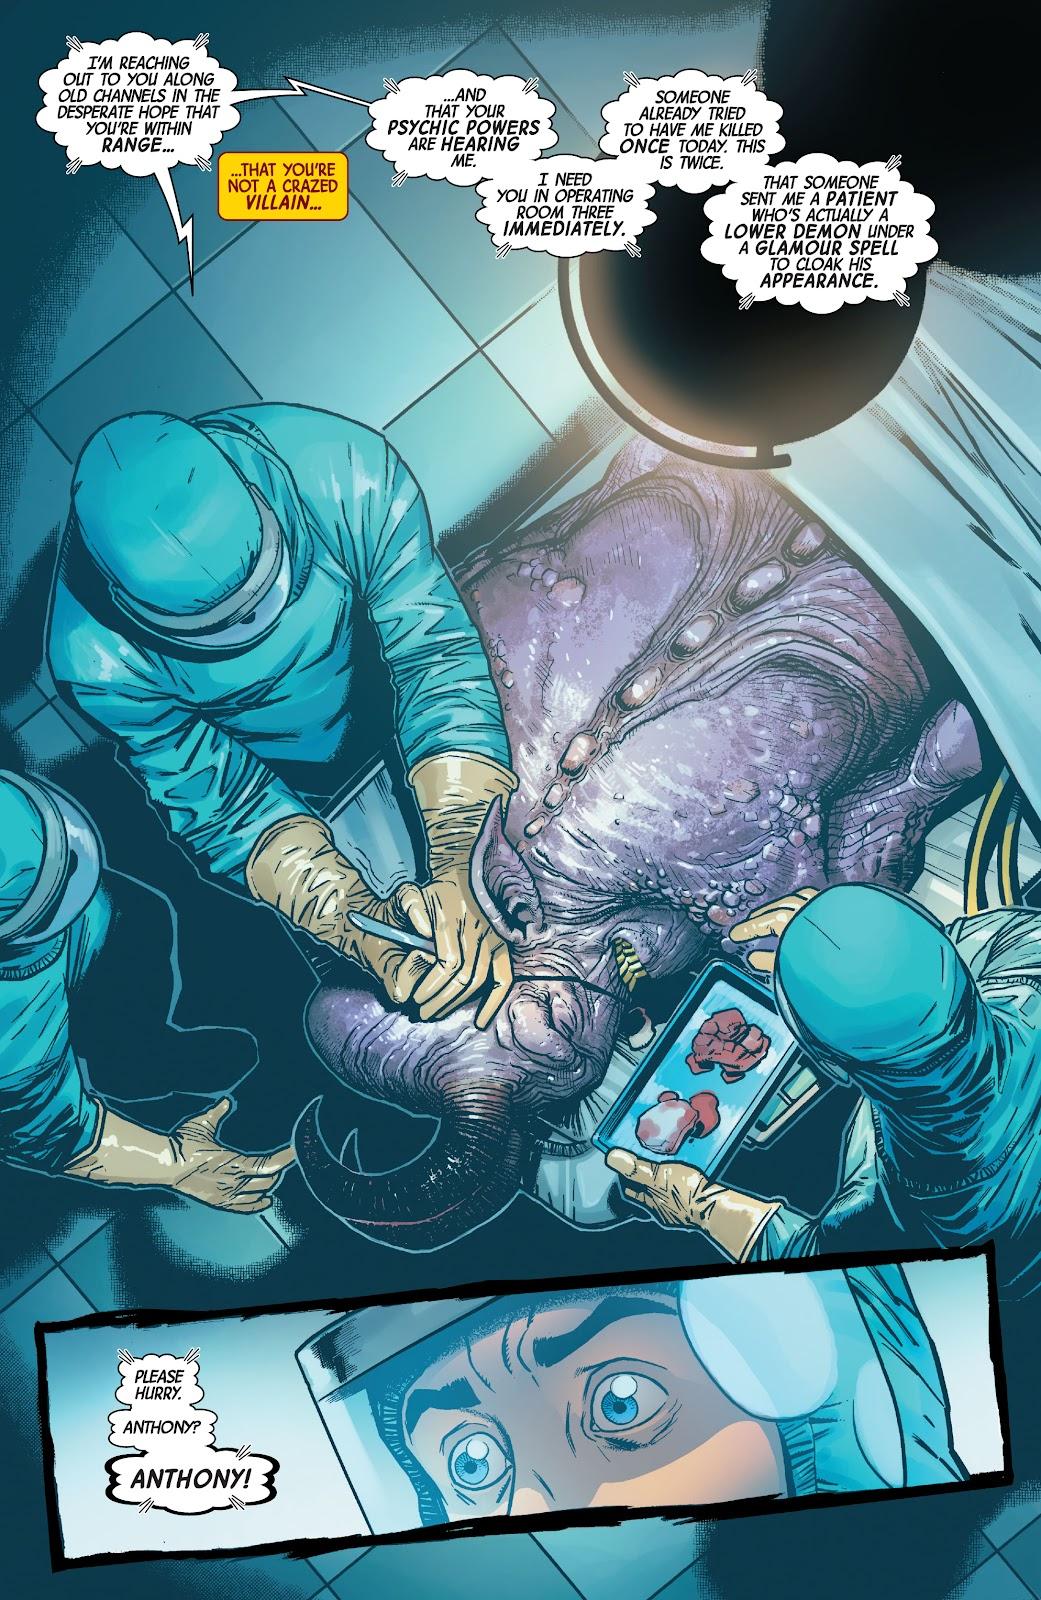 Read online Dr. Strange comic -  Issue #4 - 14